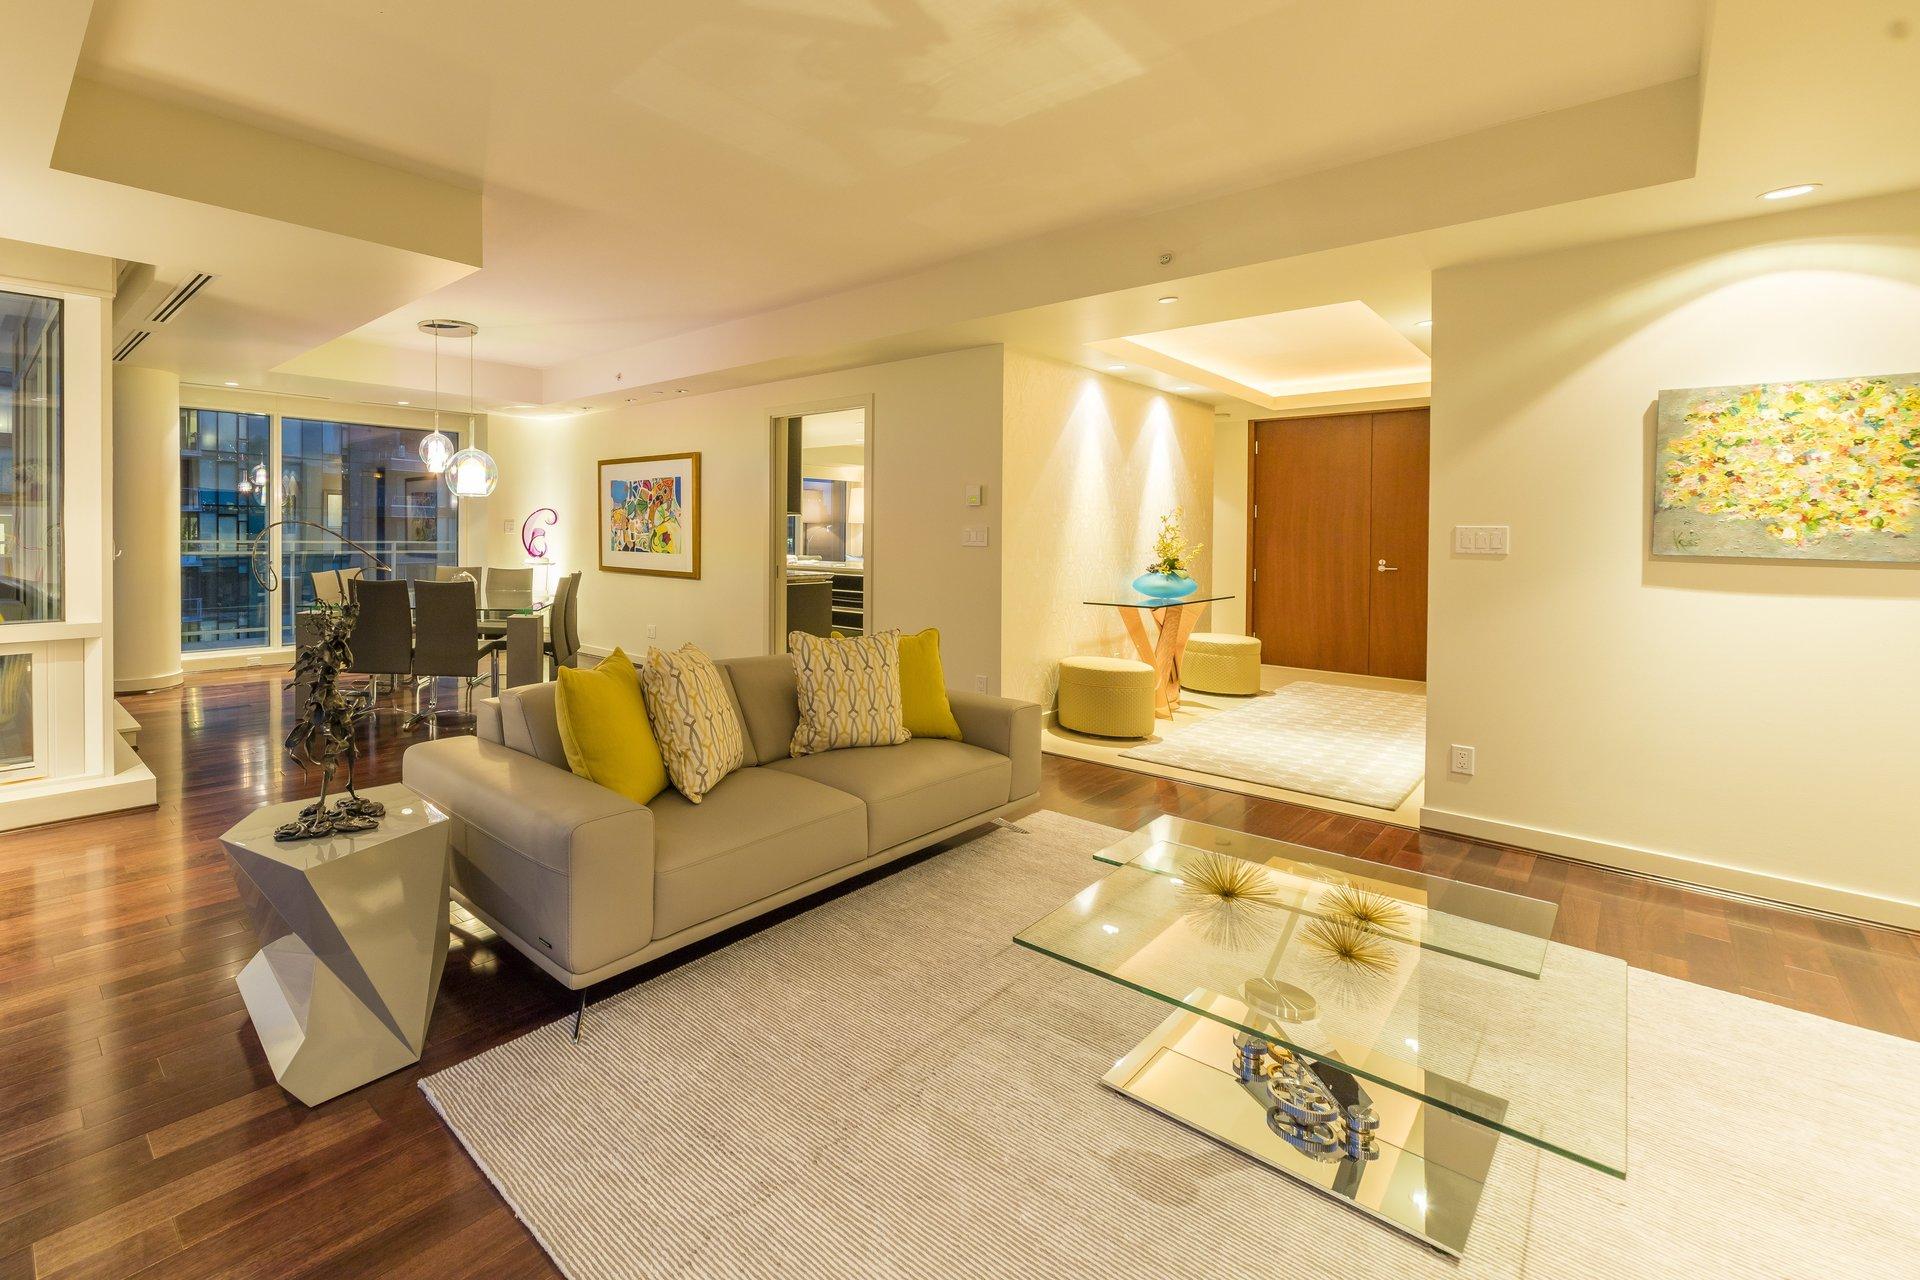 67 interior design consultation vancouver top for Interior design consultation